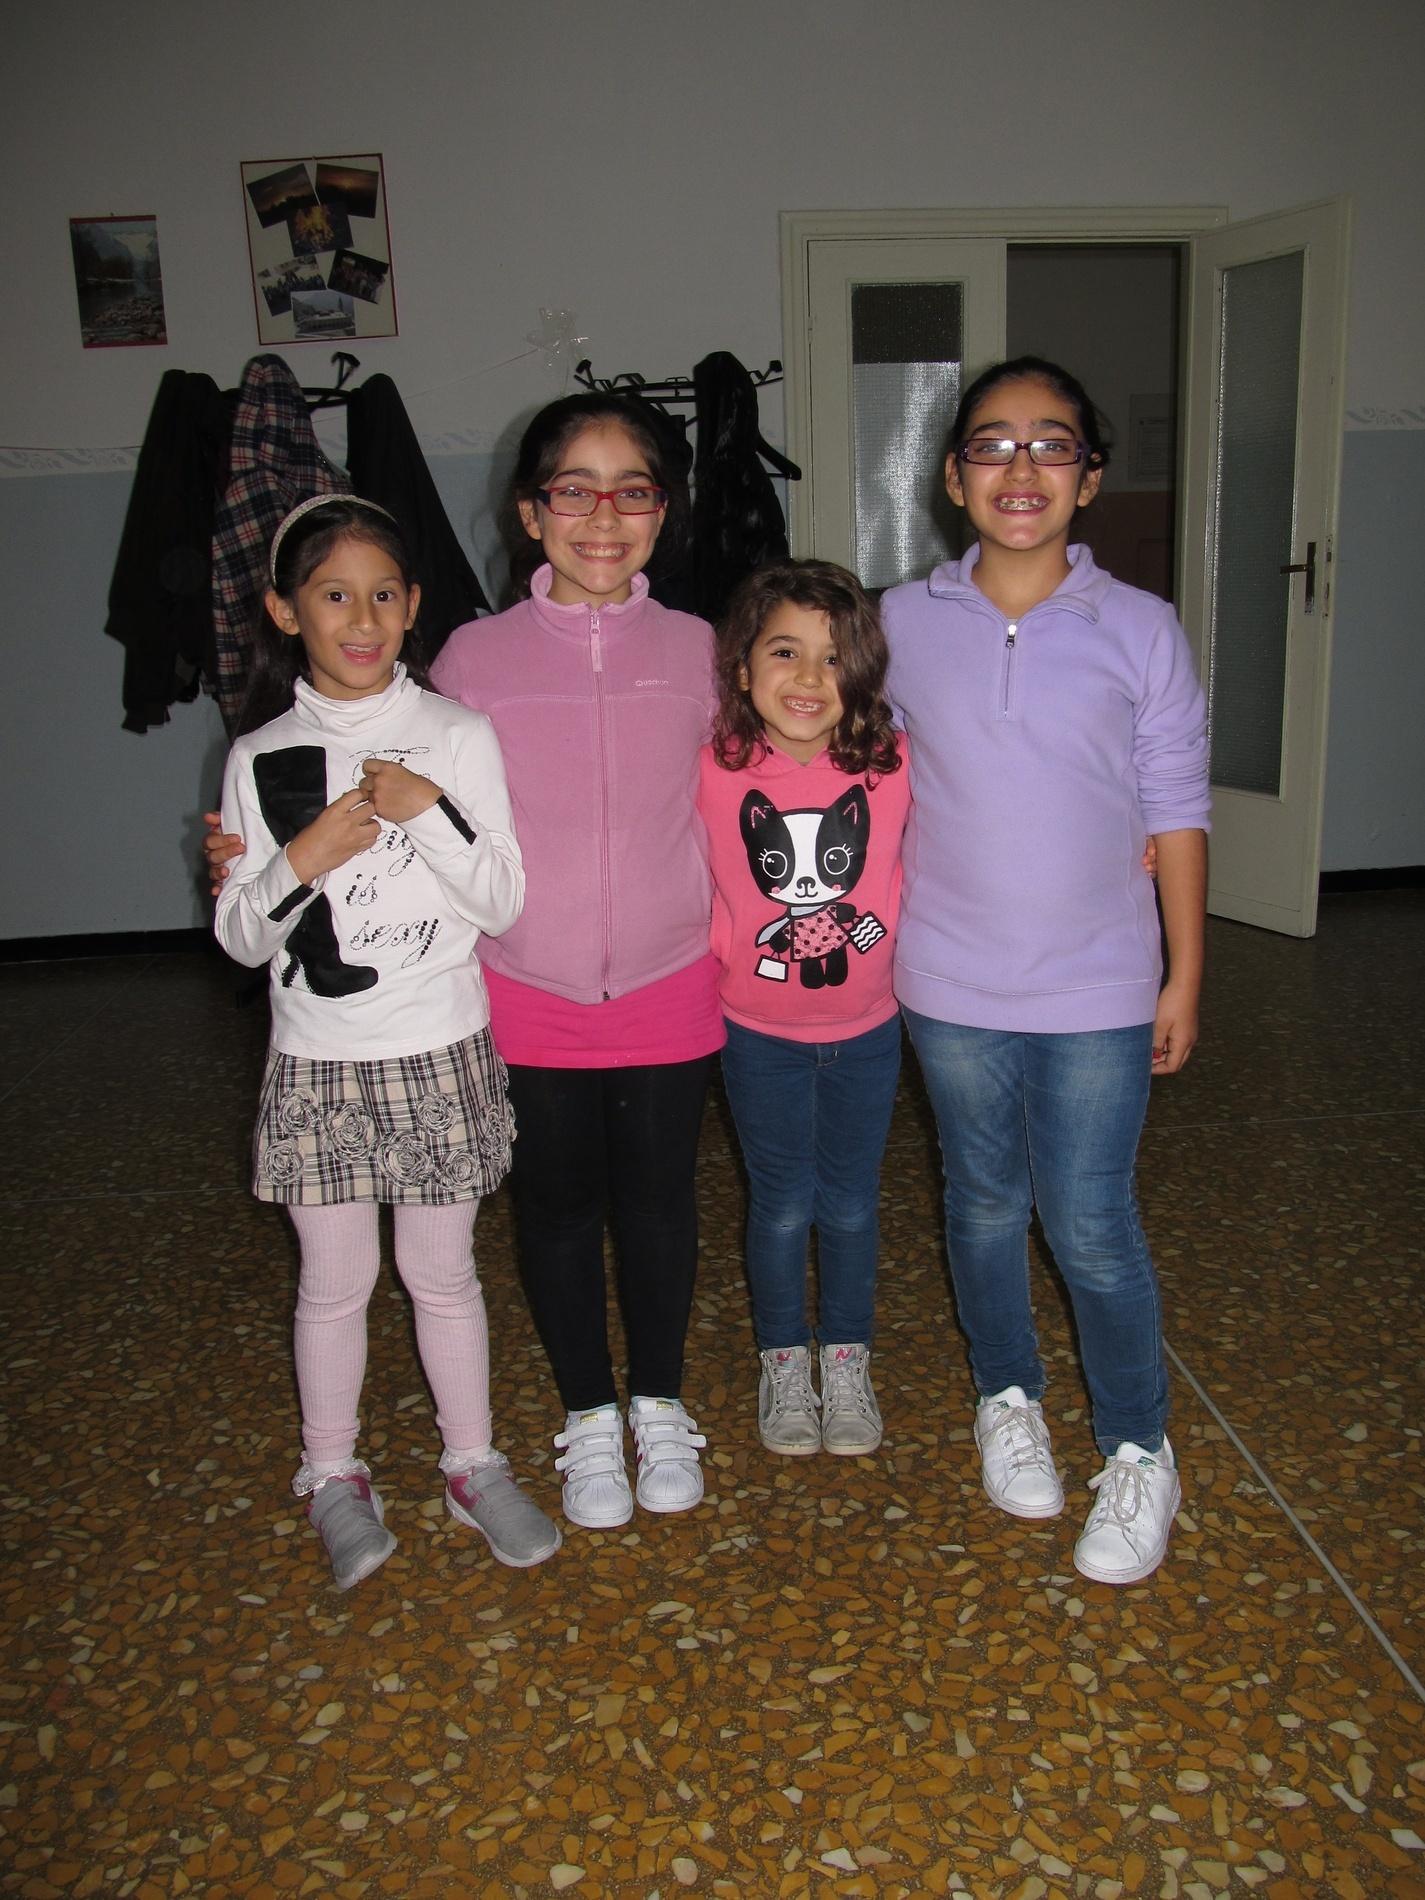 cena-famiglie-catechismo-2015-12-05-21-05-19